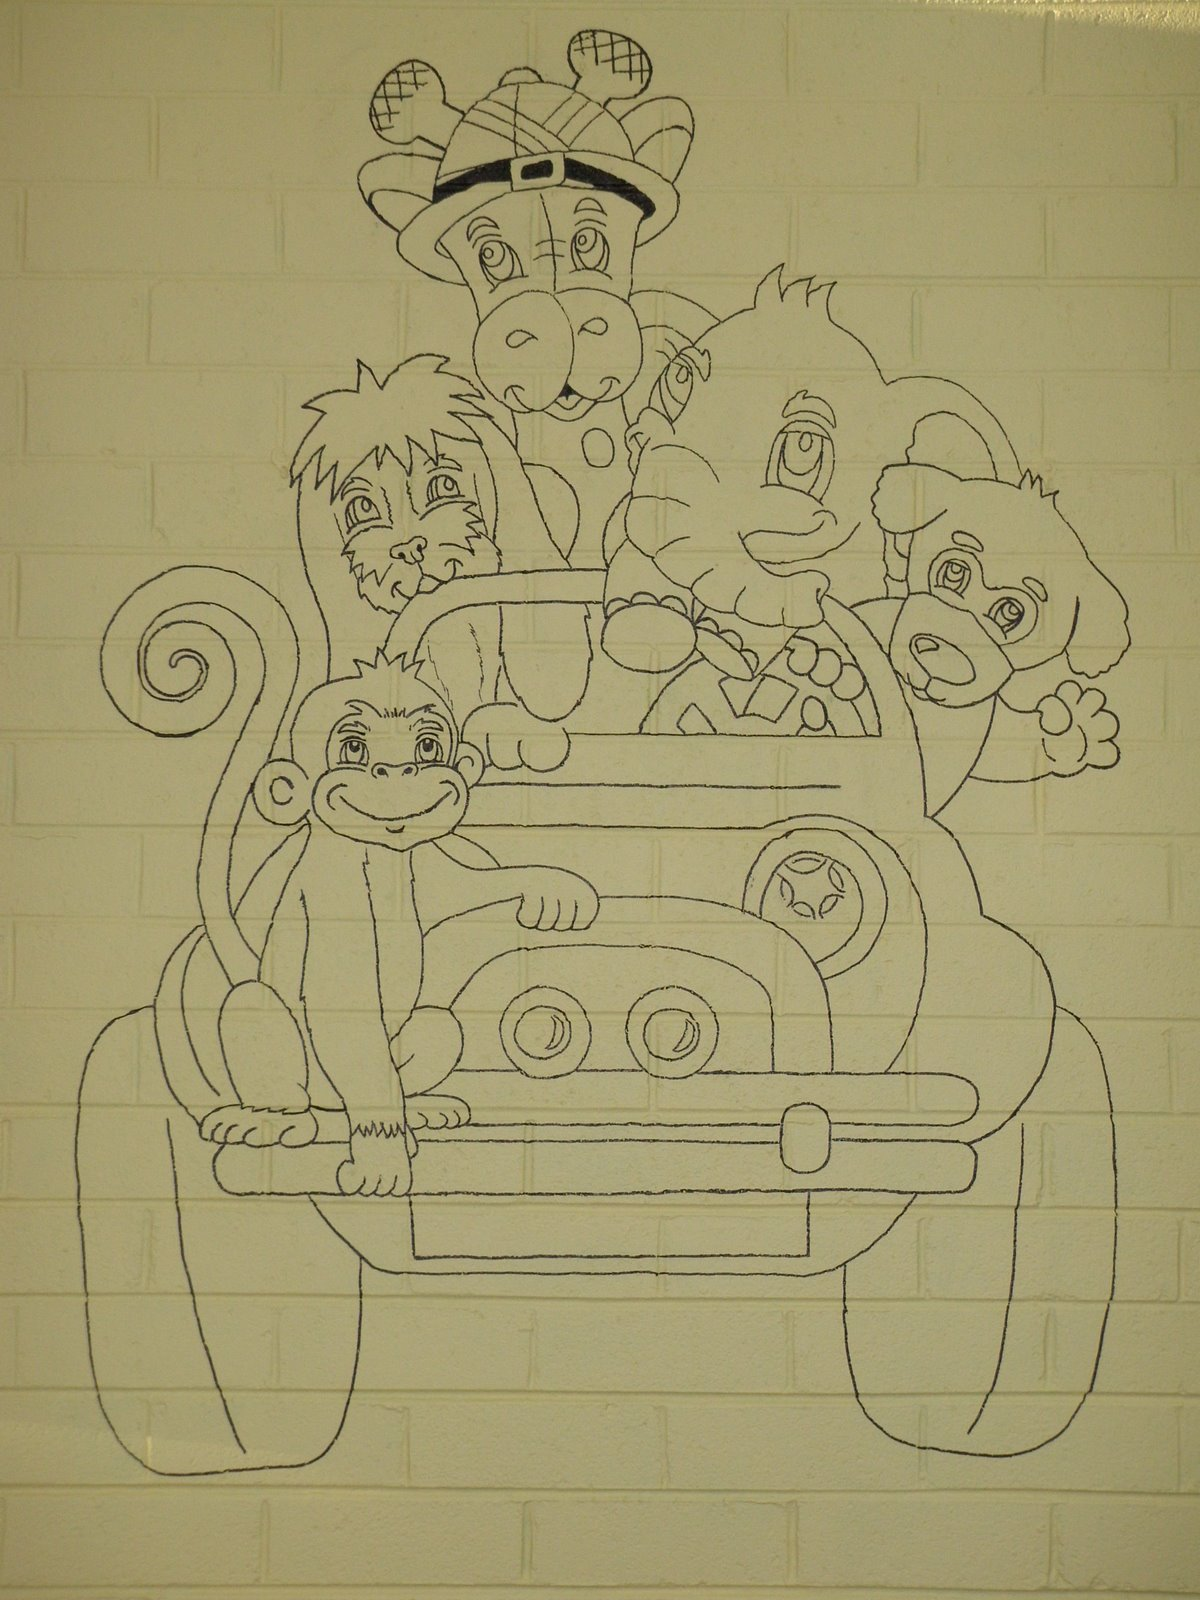 [Jeep]